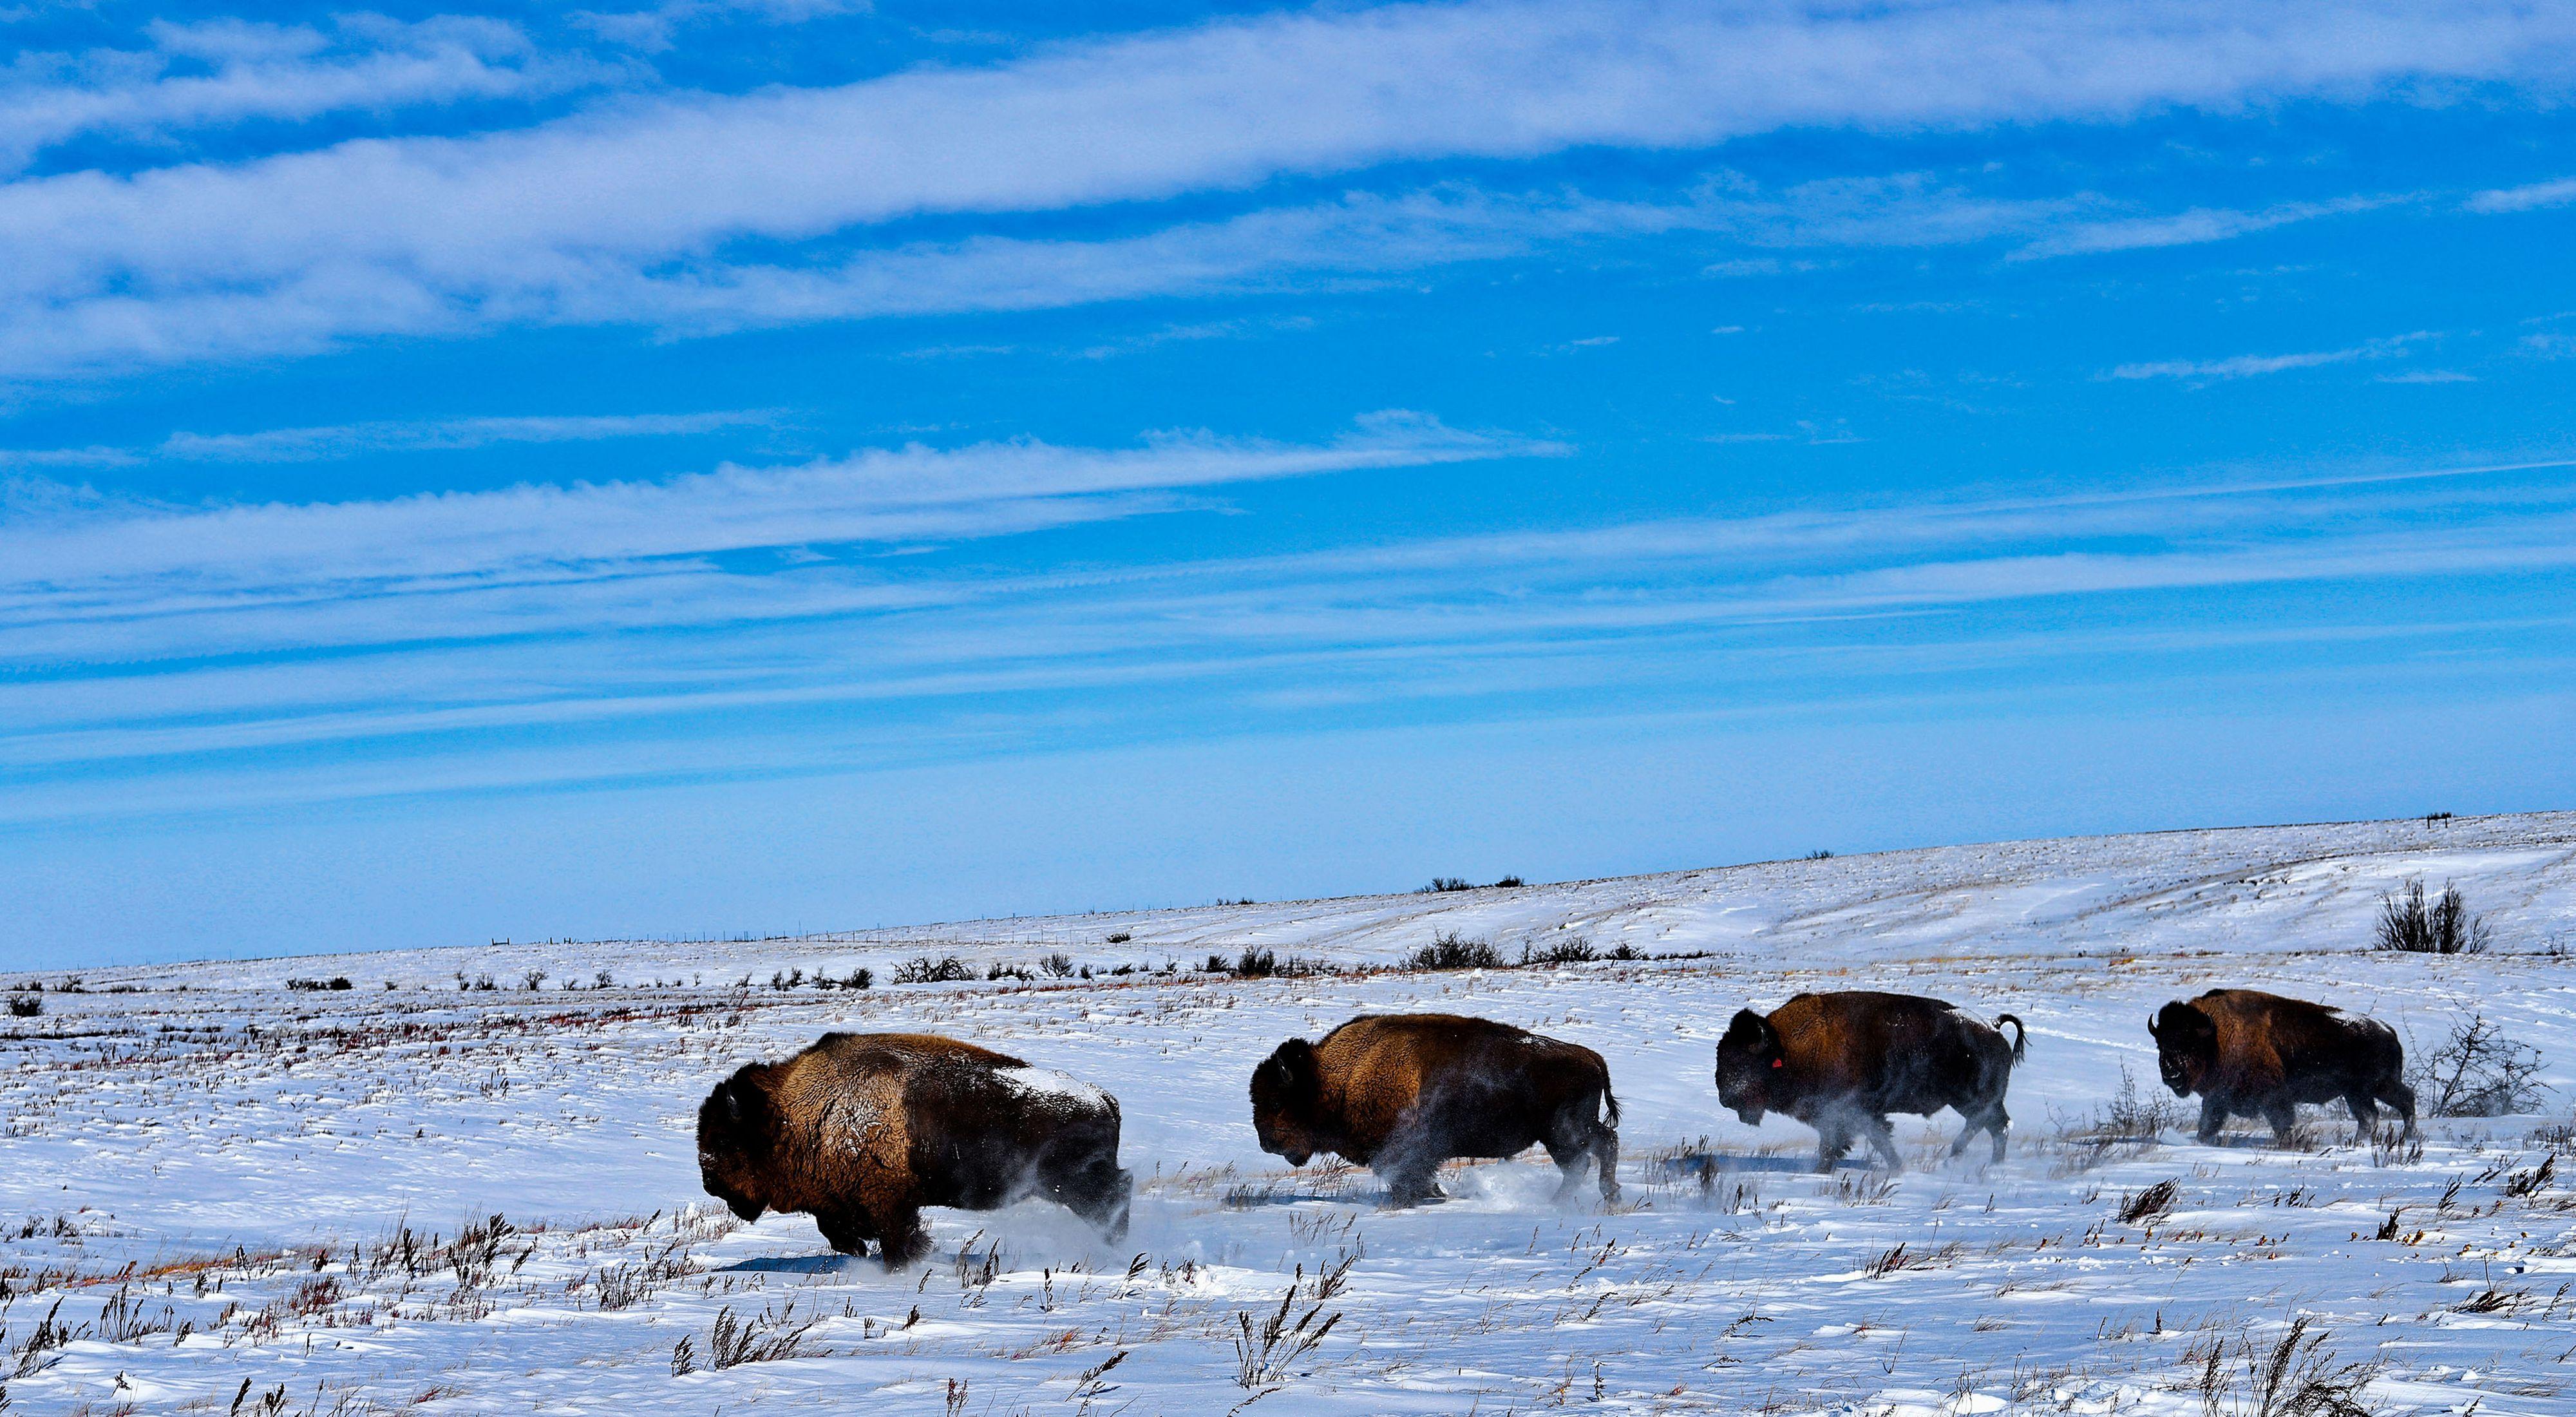 Four bison stomping through the prairie snow.